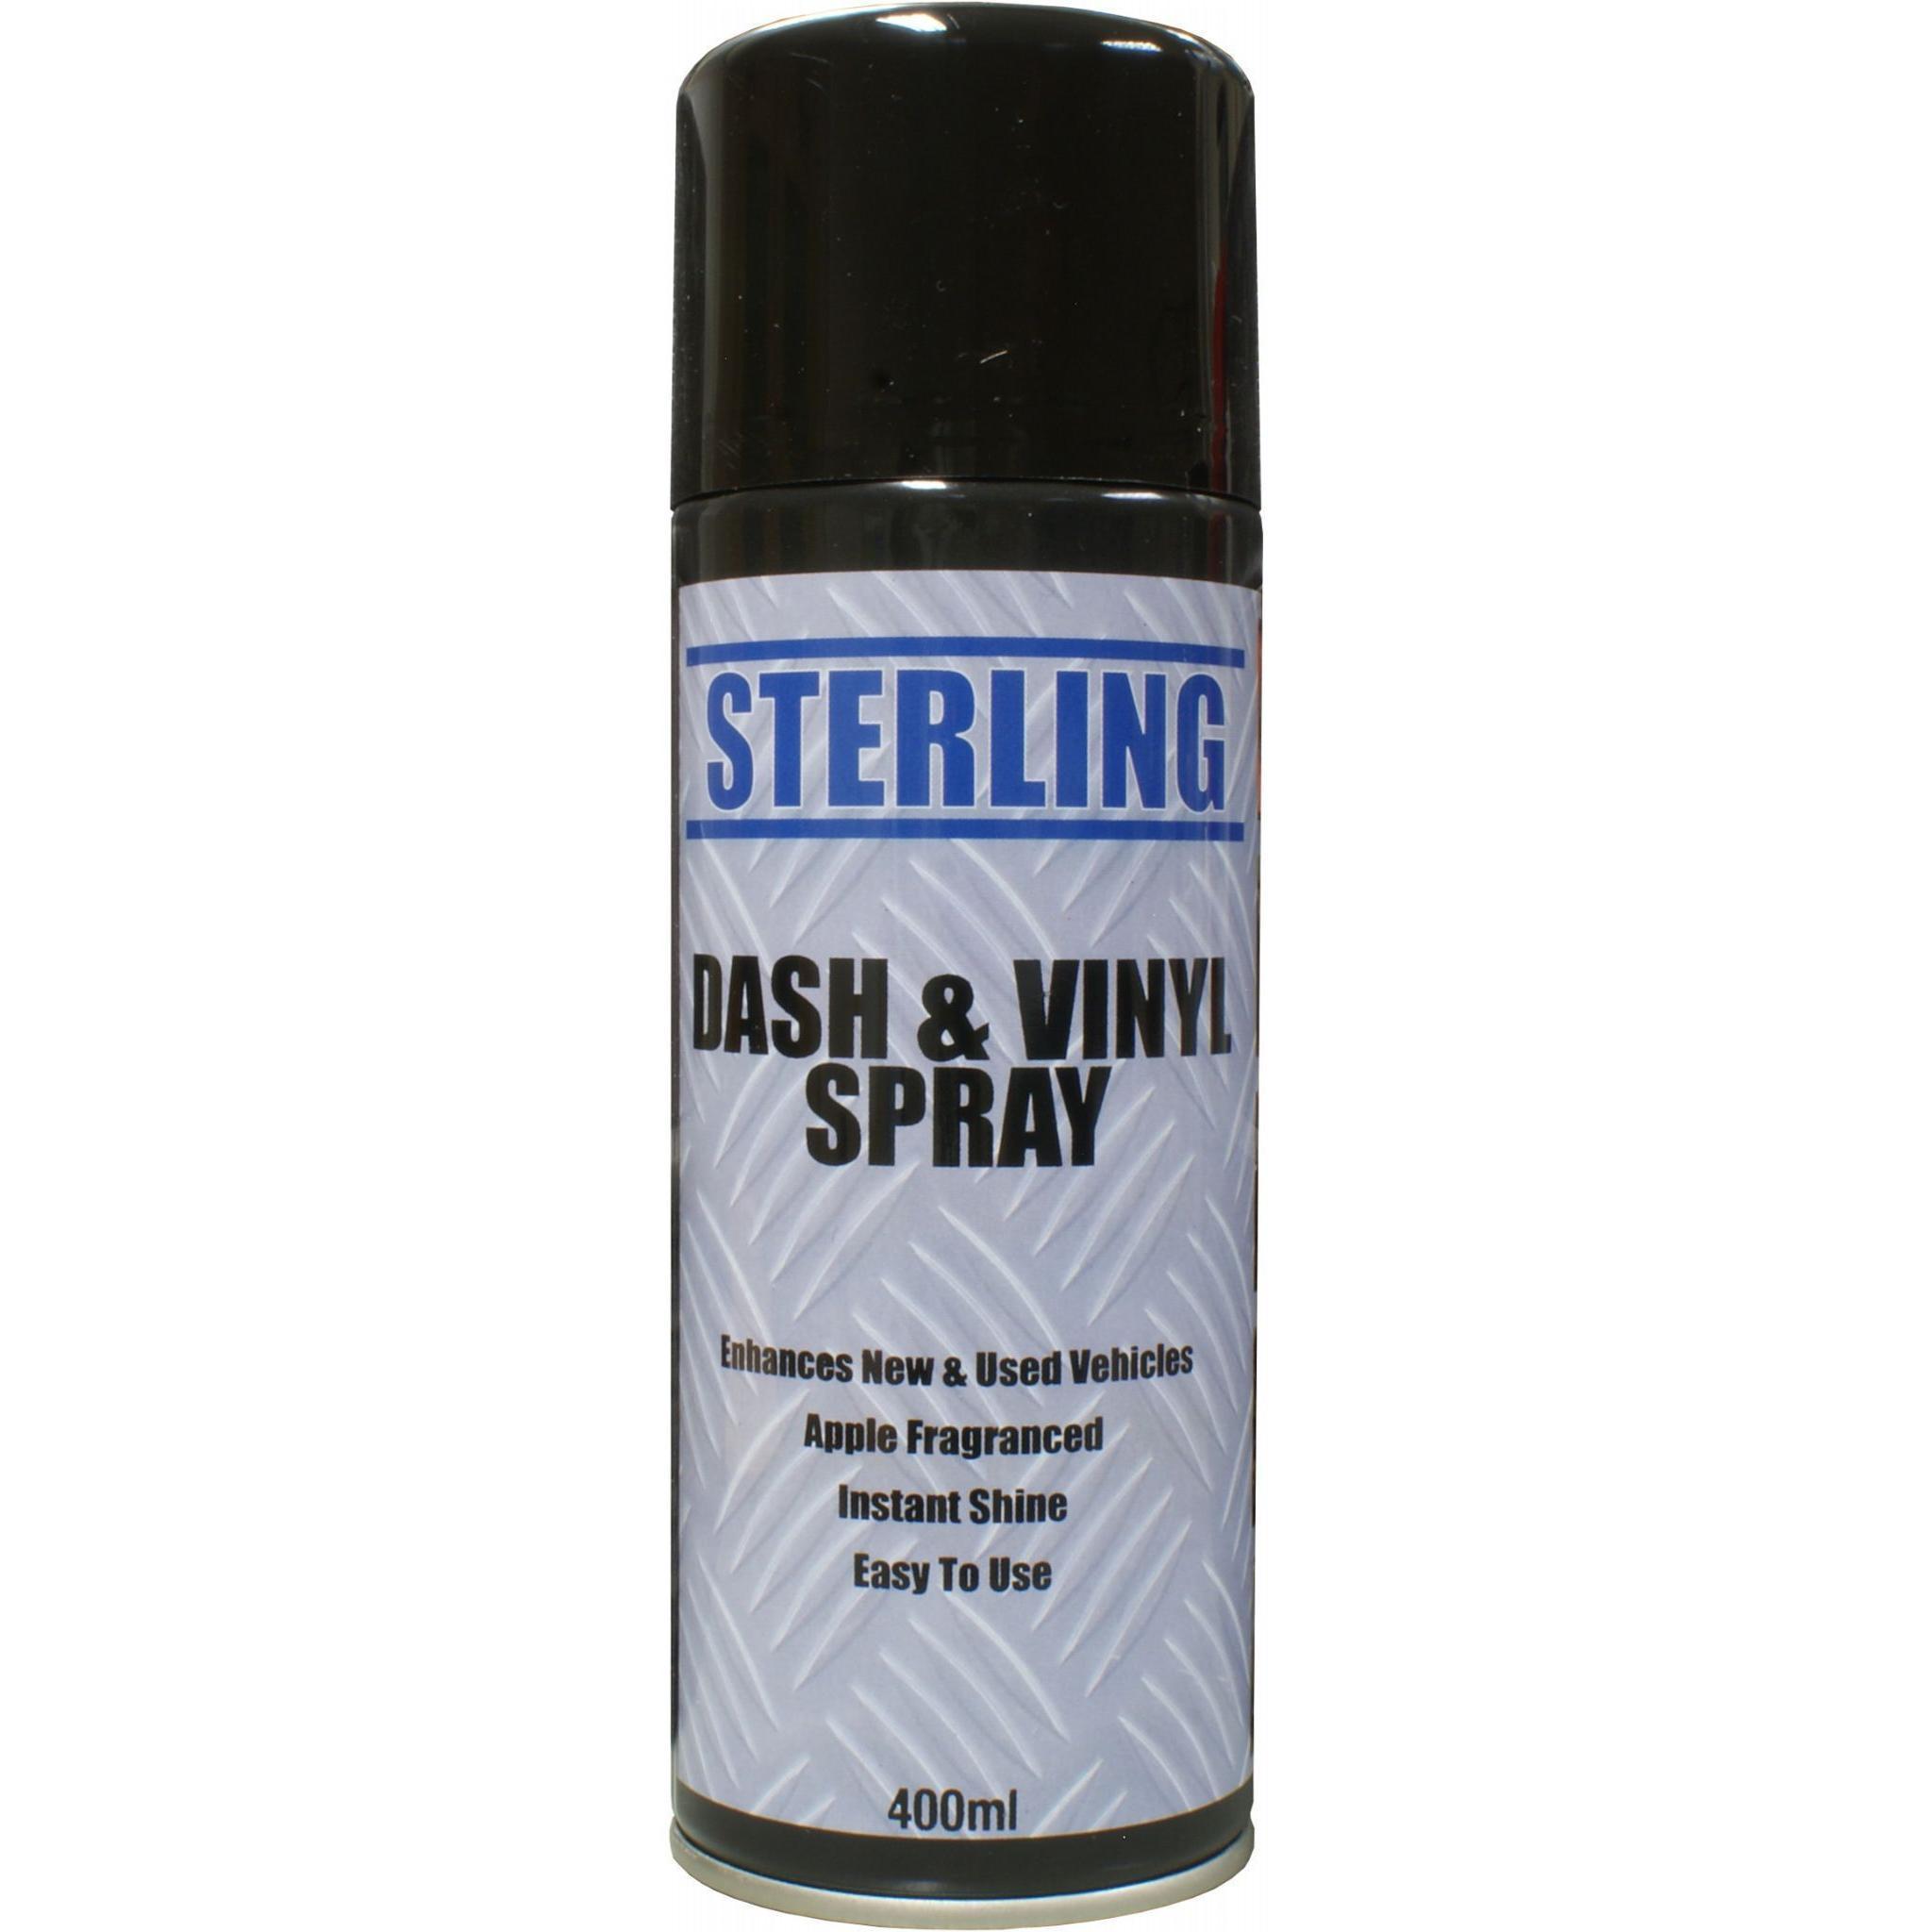 Sterling Dash and Vinyl (apple scented) Aerosol/Spray (400ml) - Car Truck  Valeting Cleaner Dashboard Dash Shine polish